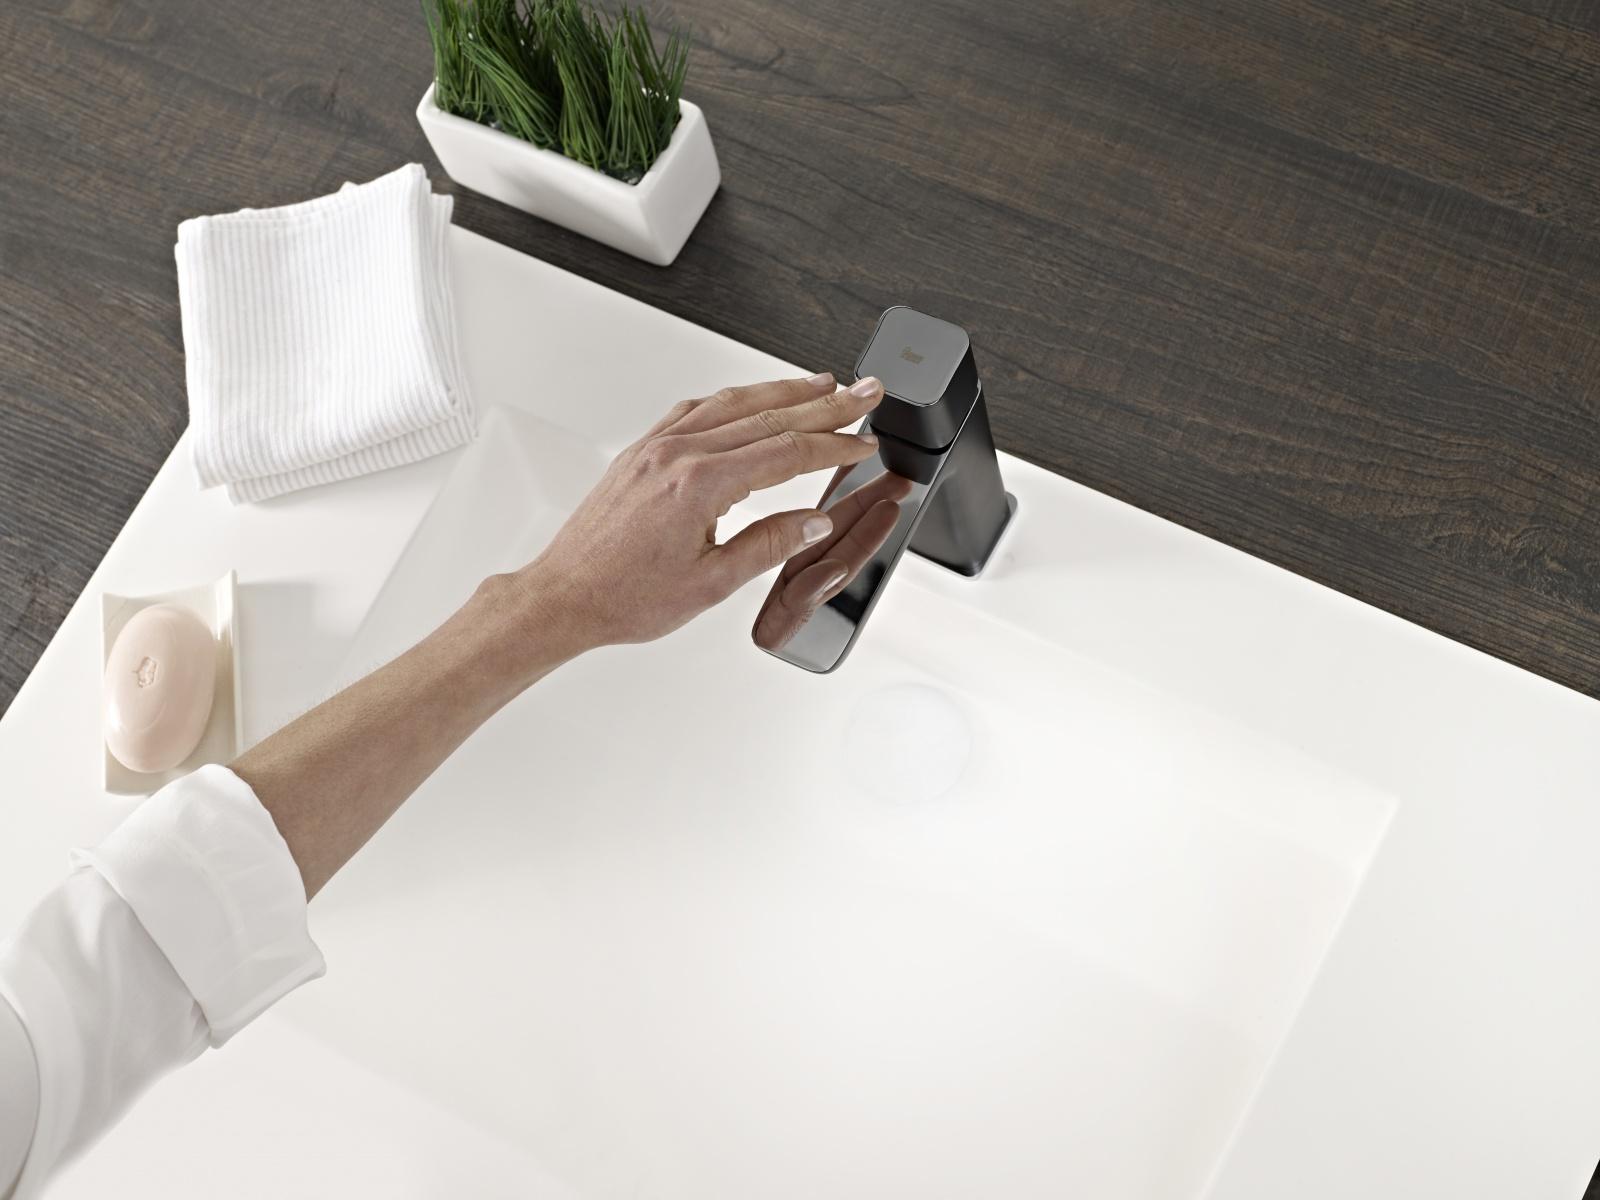 teka design armatur schwarz chrom wasserhahn. Black Bedroom Furniture Sets. Home Design Ideas